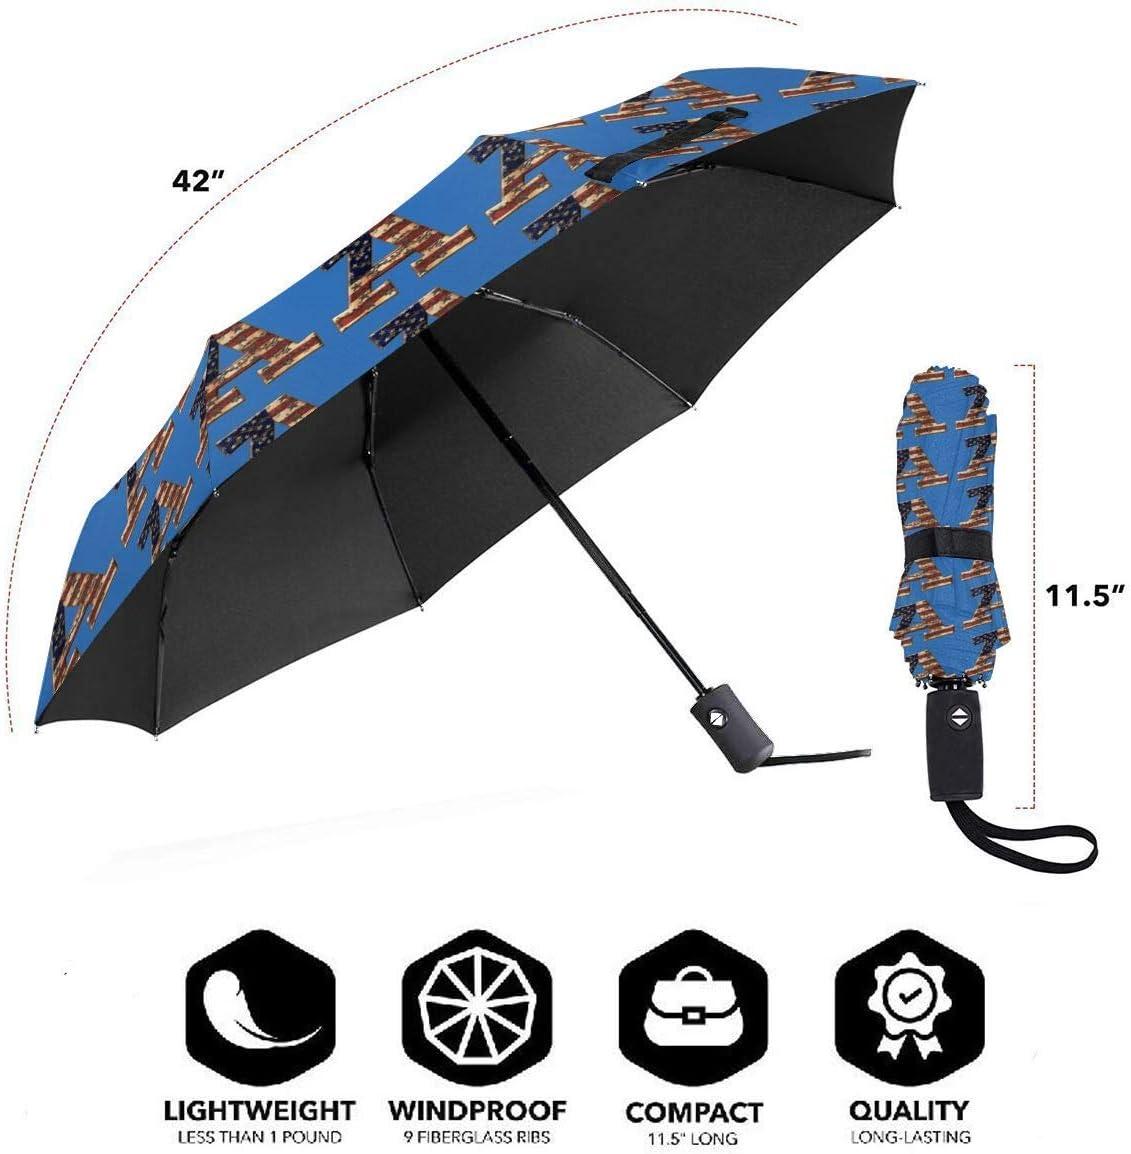 American Flag A Automatic Tri-Fold Umbrella Parasol Sun Umbrella Sunshade